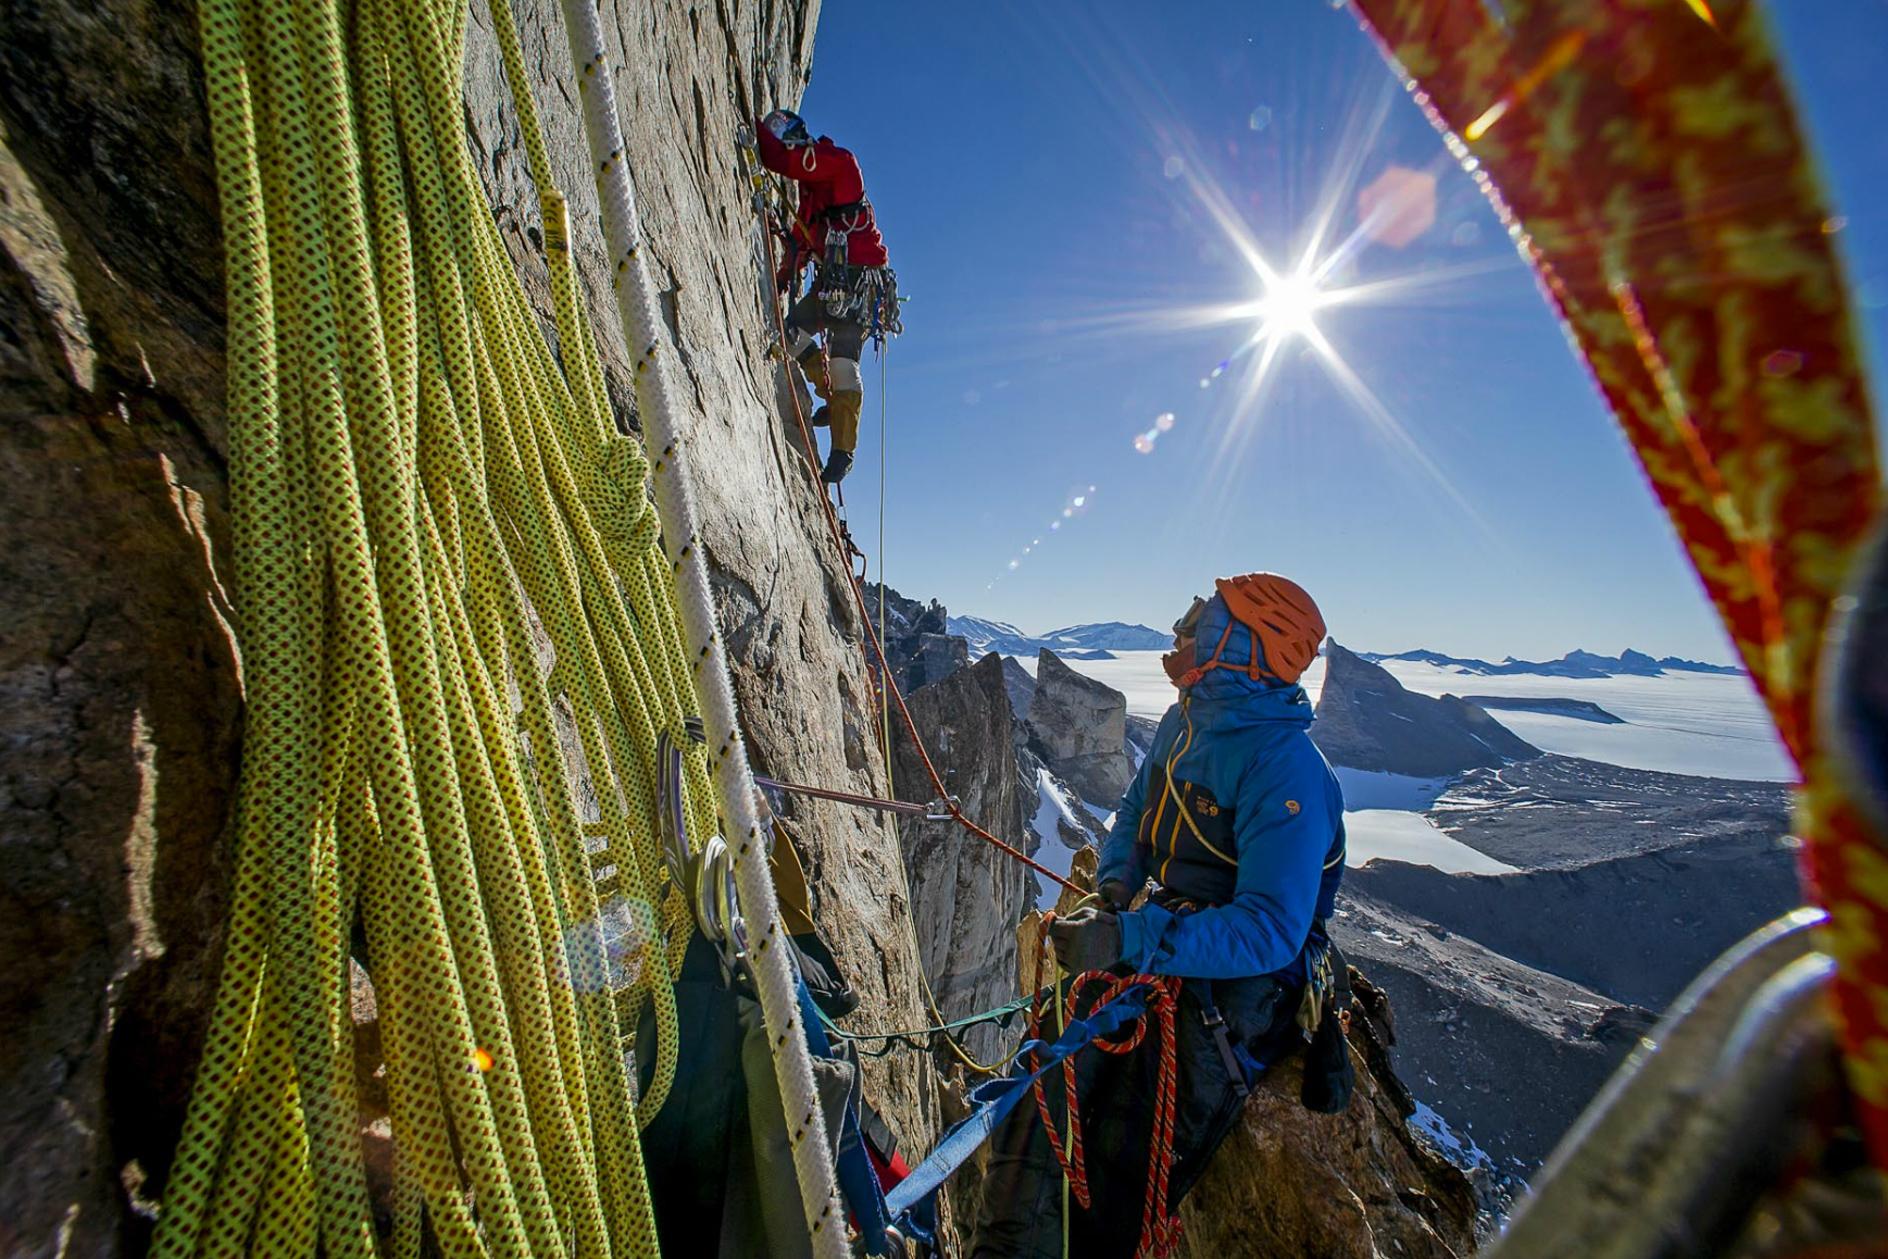 Cory-Richards-Photographer-Antarctica-15.jpg